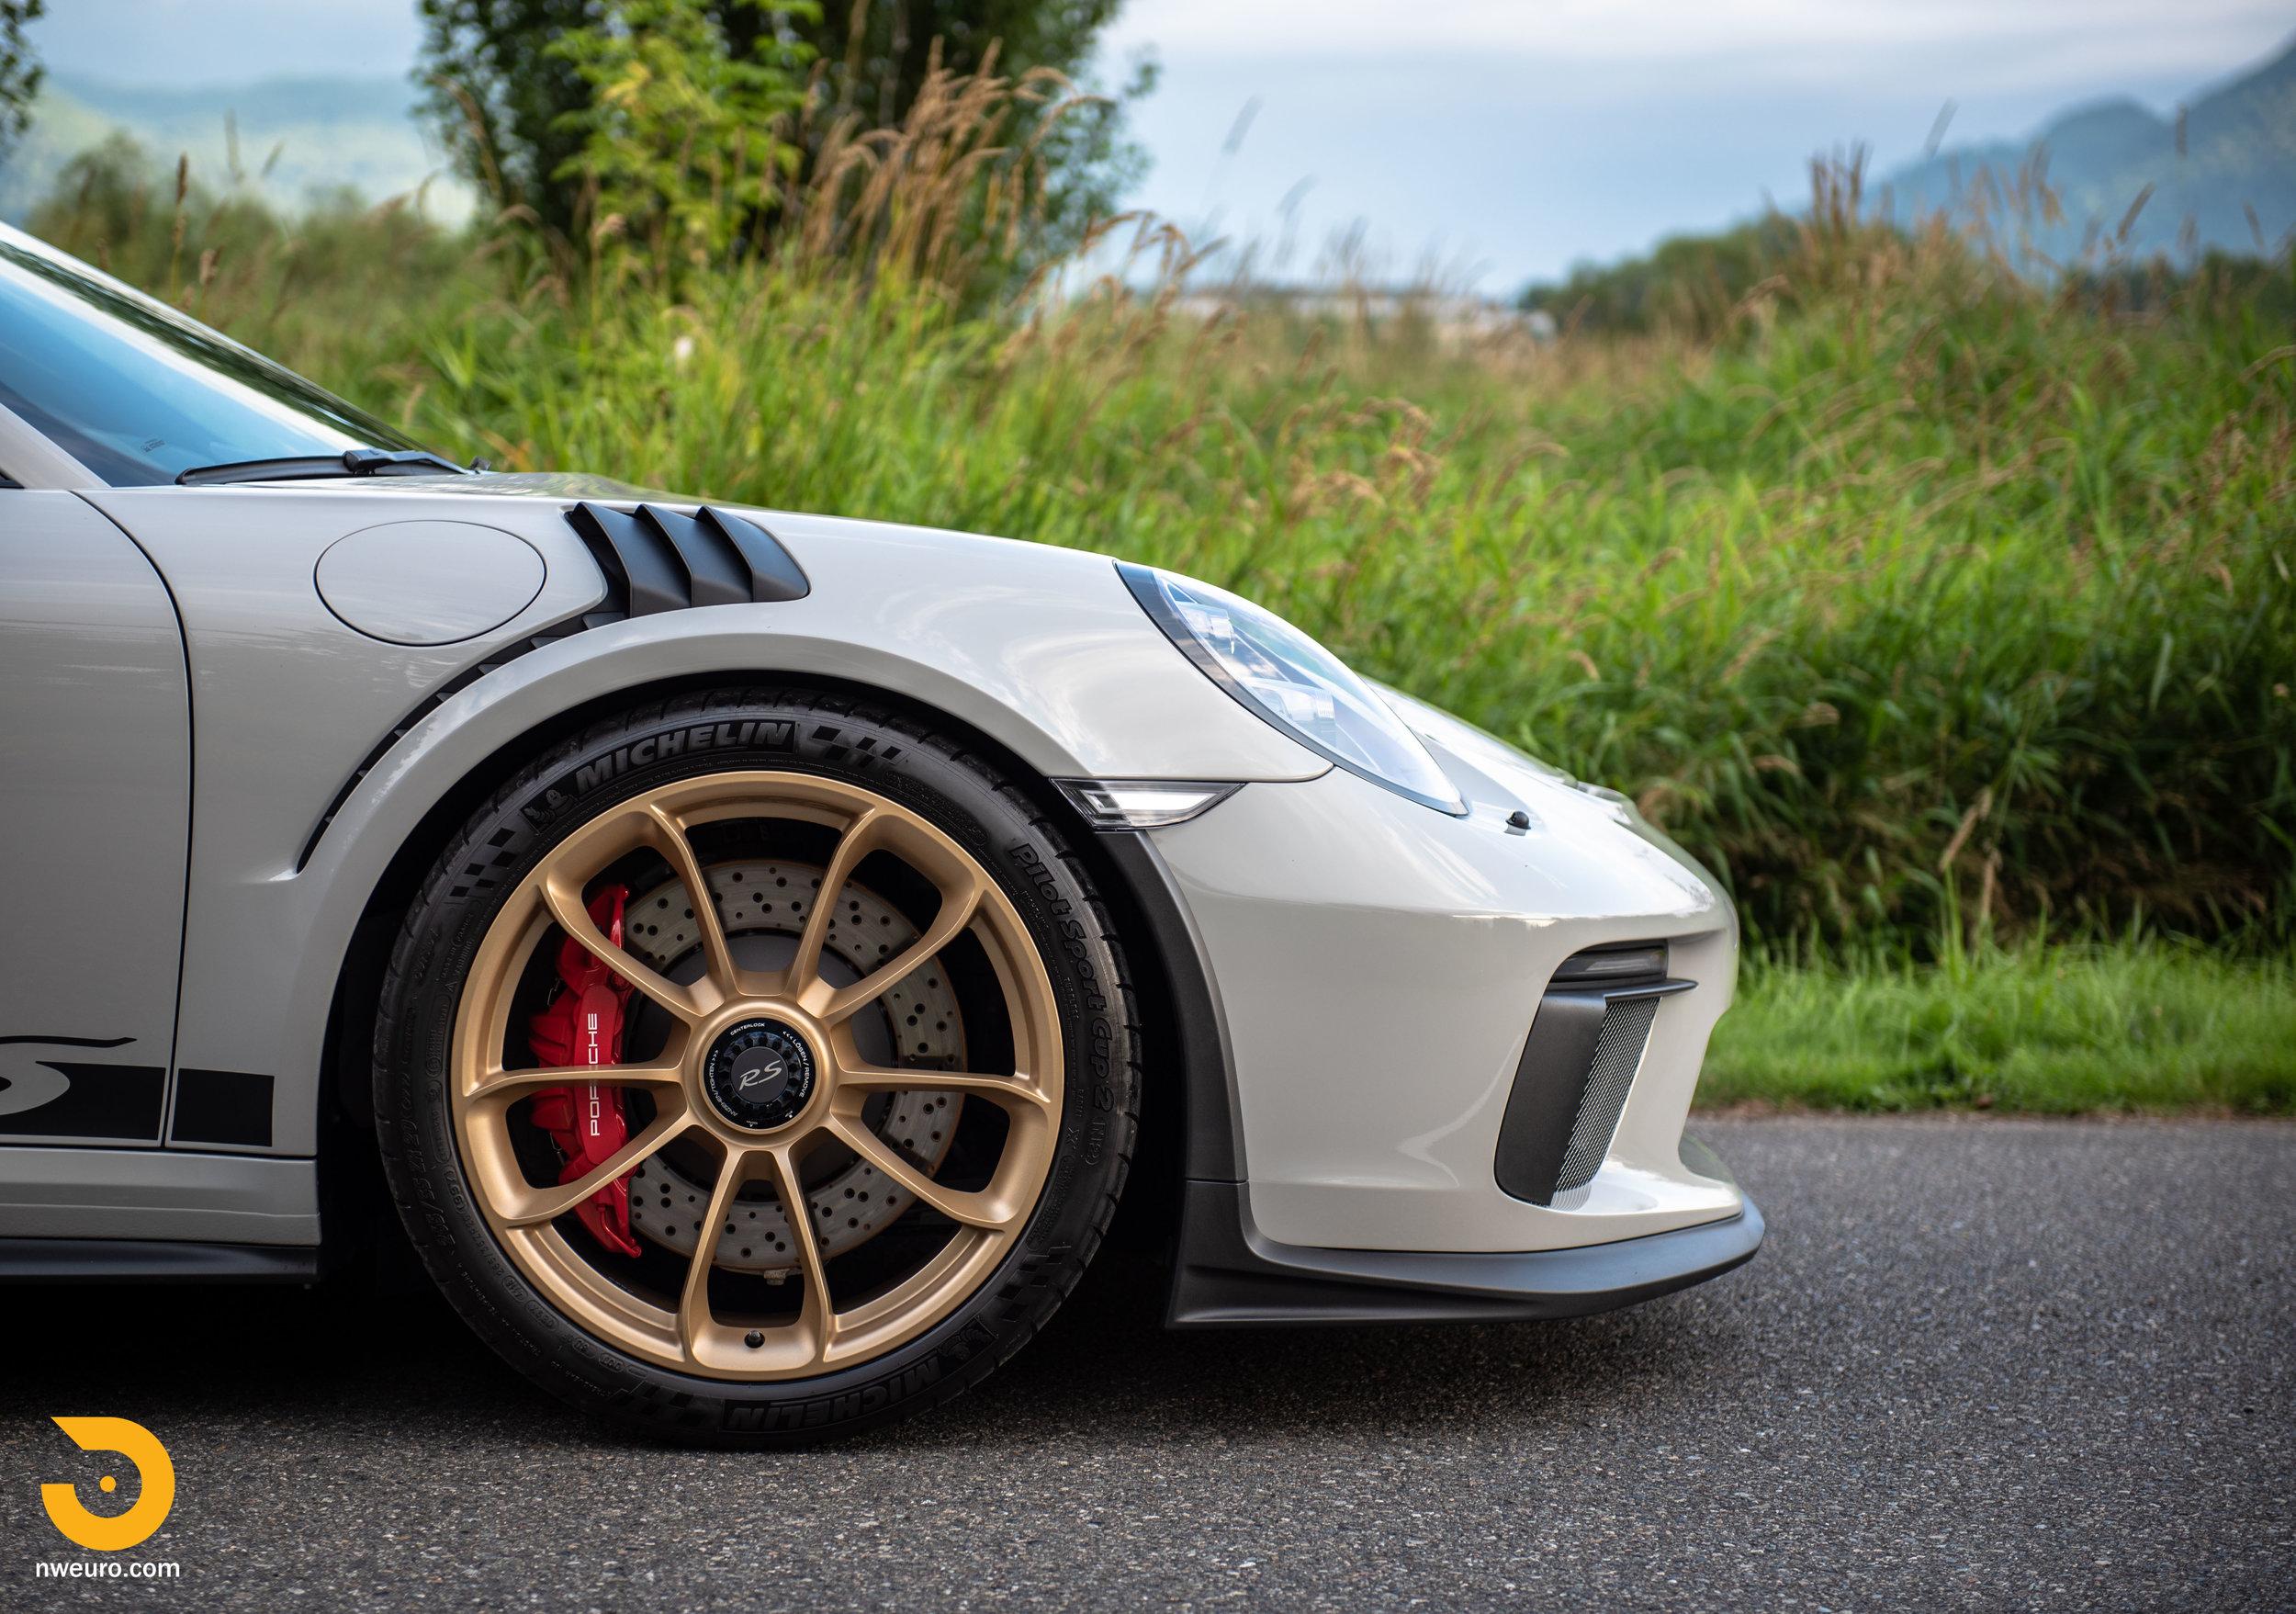 2019 Porsche GT3 RS - Chalk-60.jpg